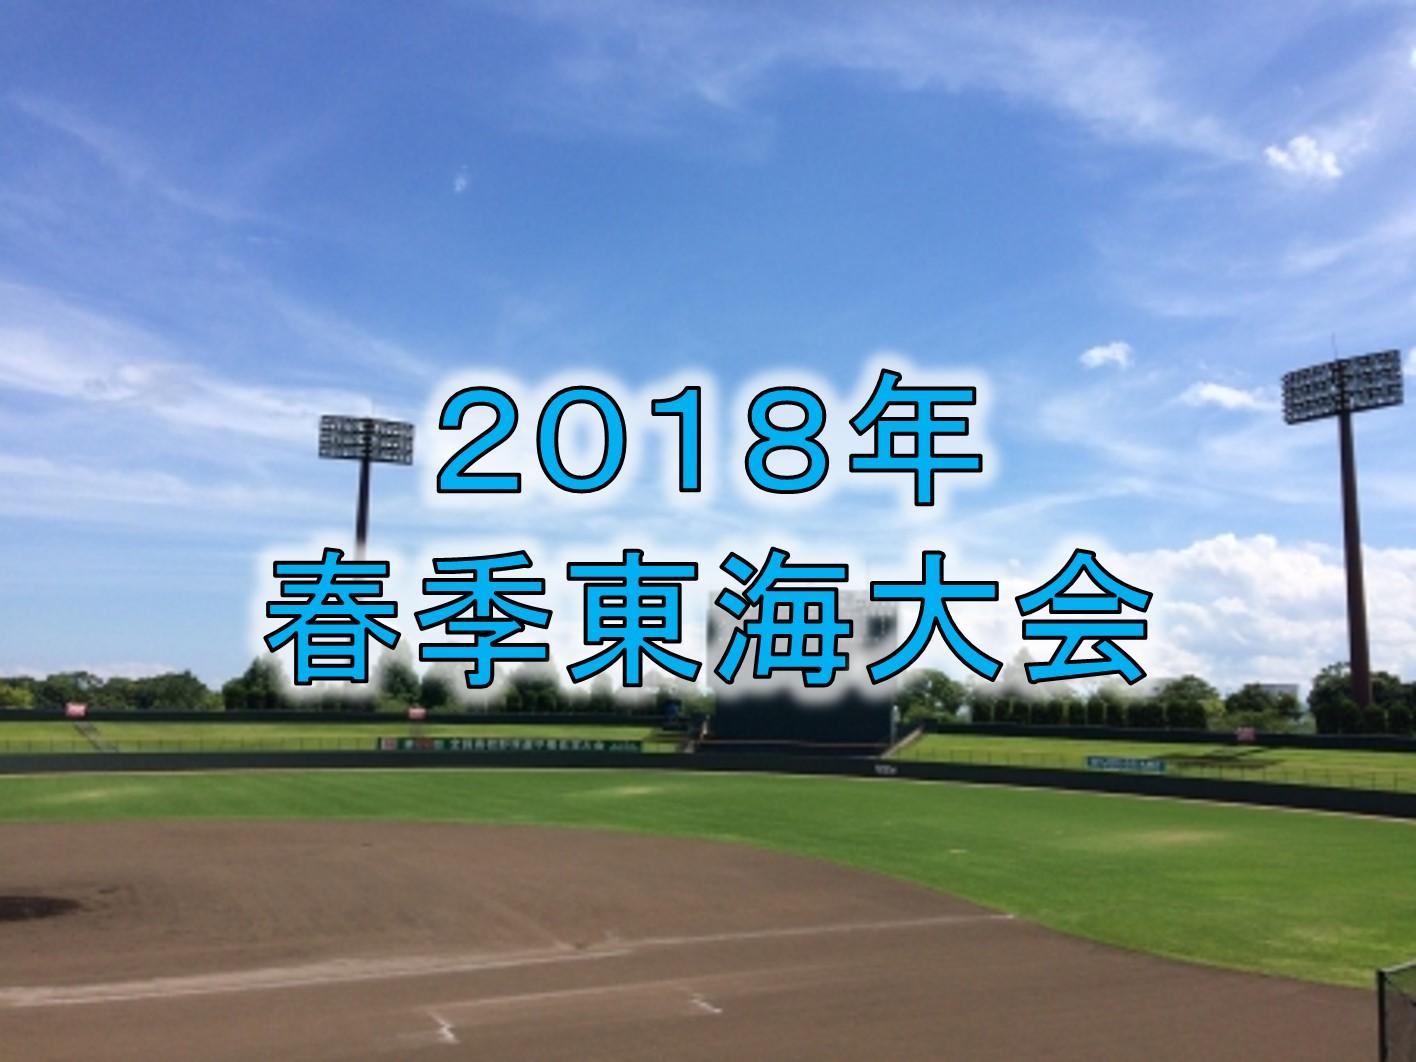 夏の高校野球東愛知県大会2018の日程と結果!優勝 …